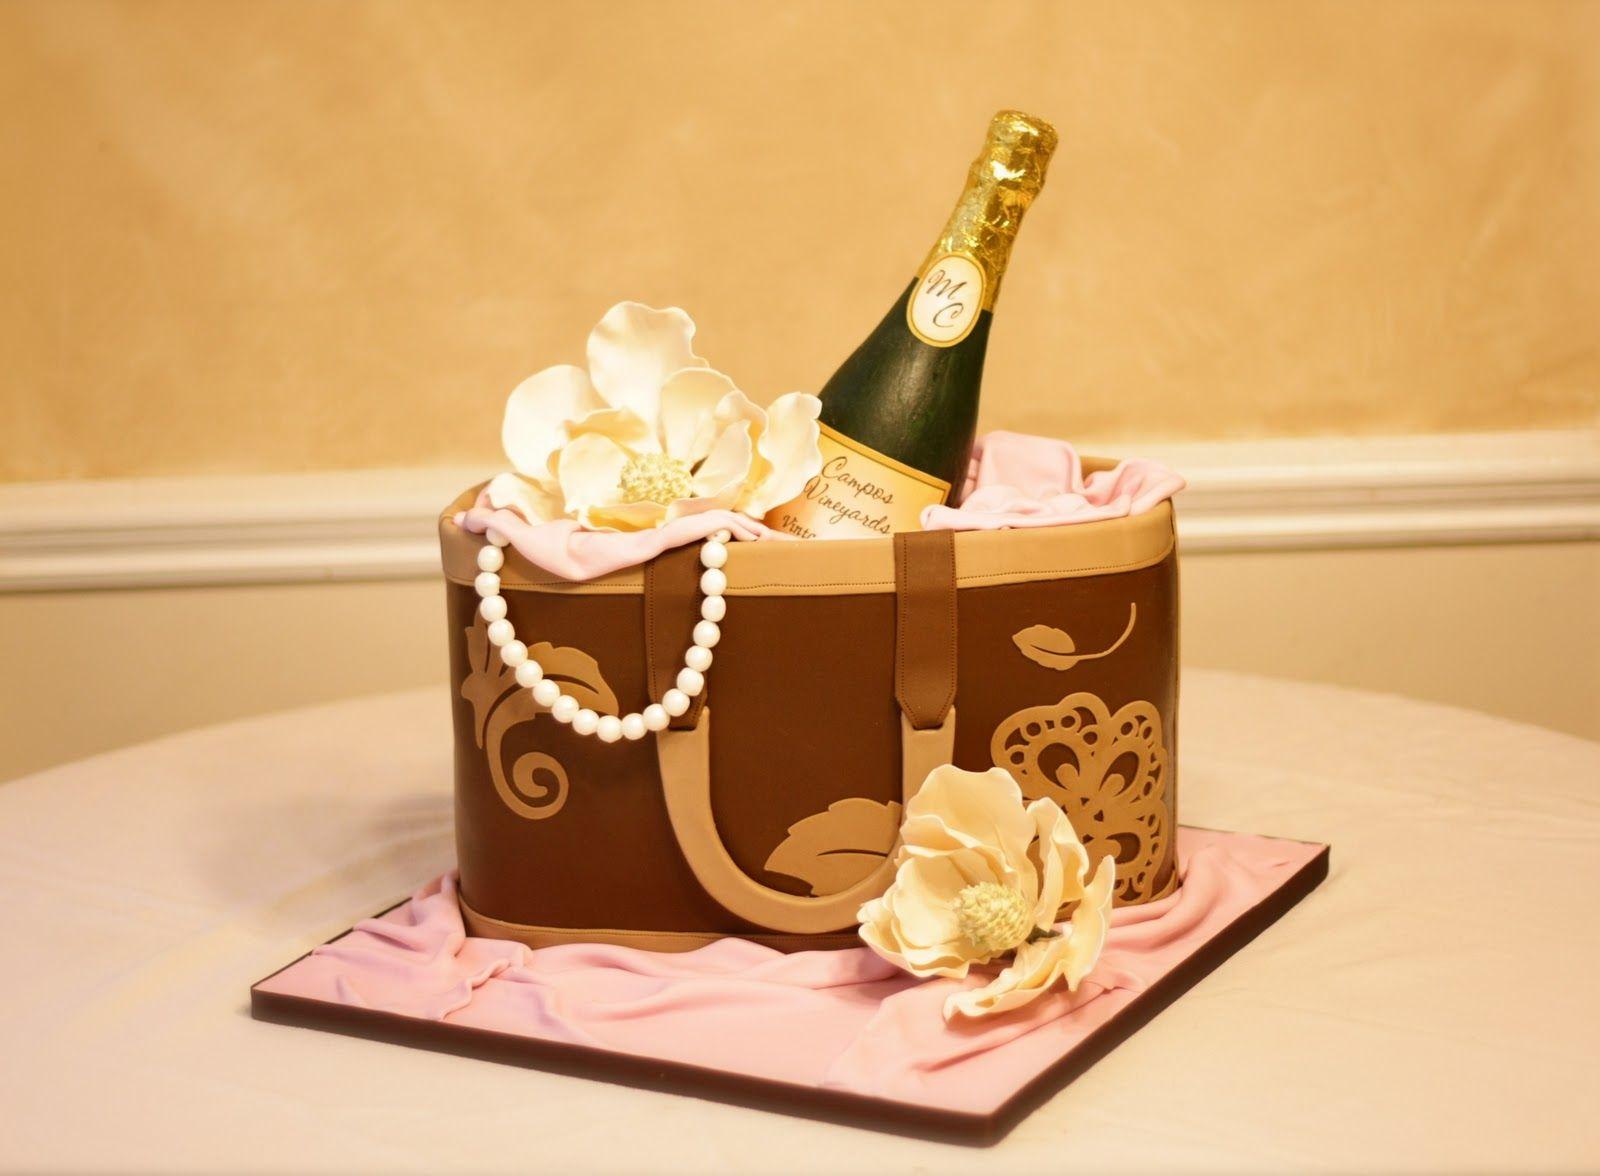 Champagne Cake Disco Cake Gift Box Cakes Champagne Cake